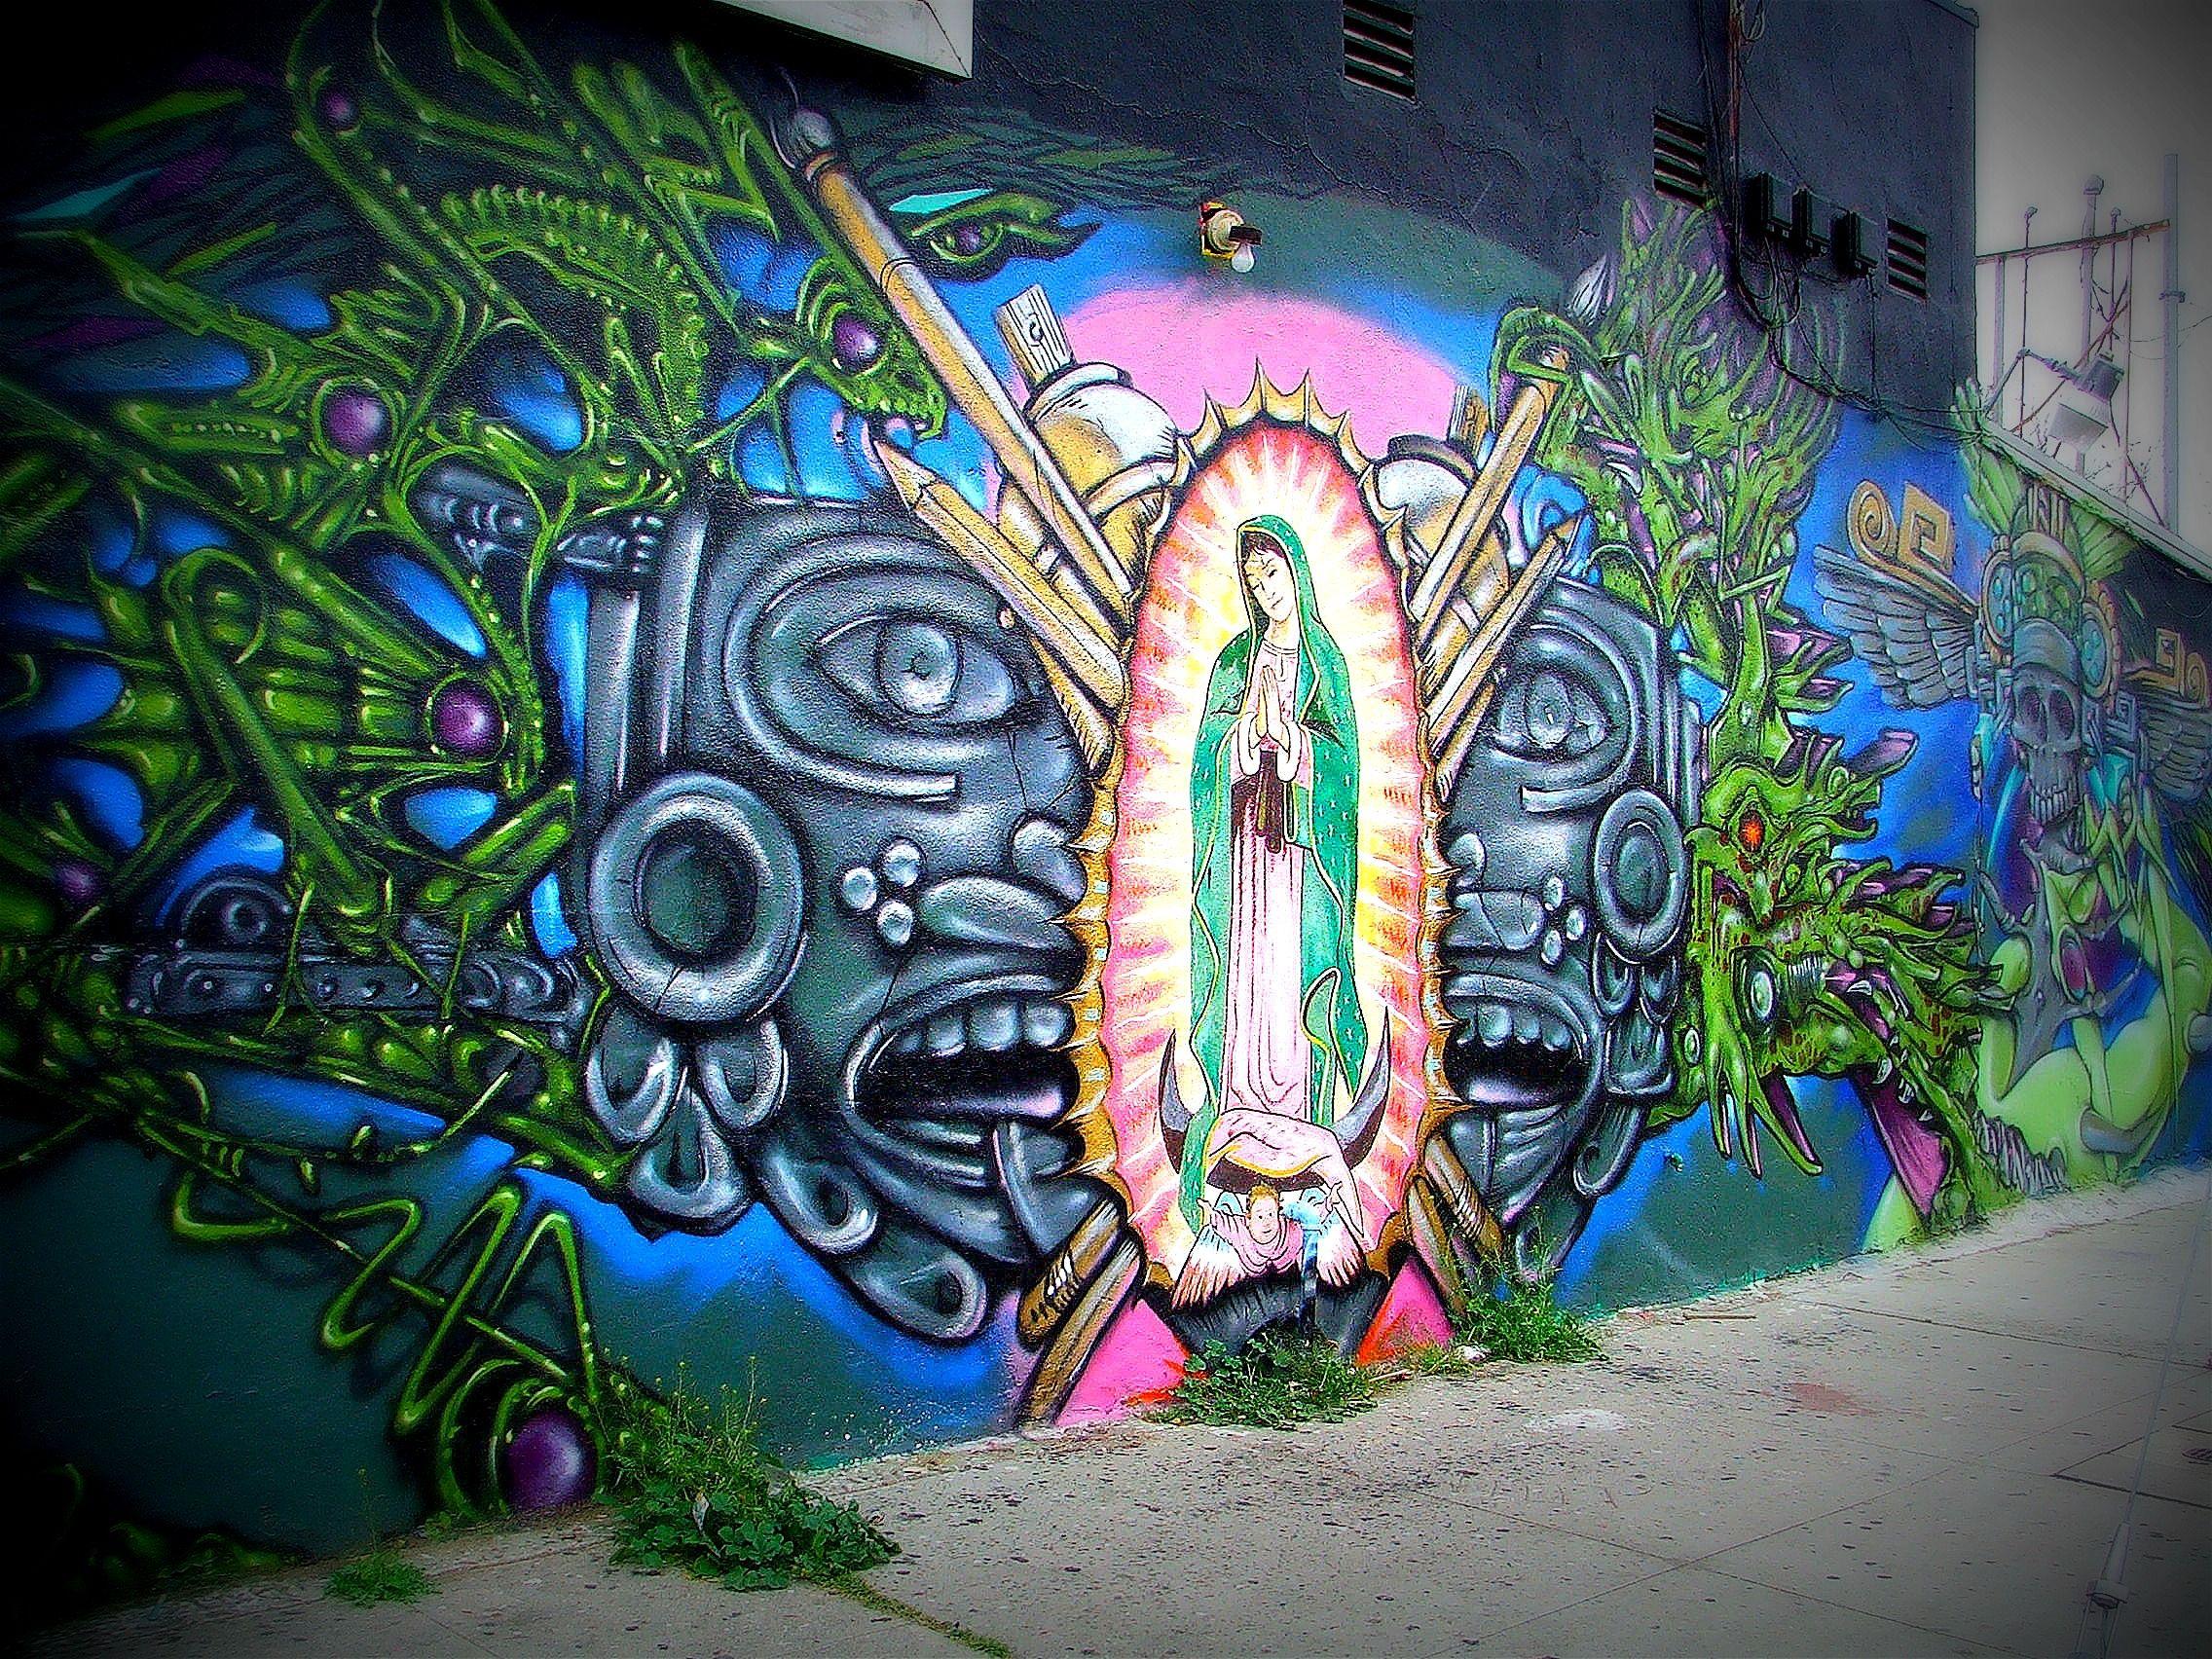 Graffiti art diy - Mural On Van Nuys Blvd In Pacoima